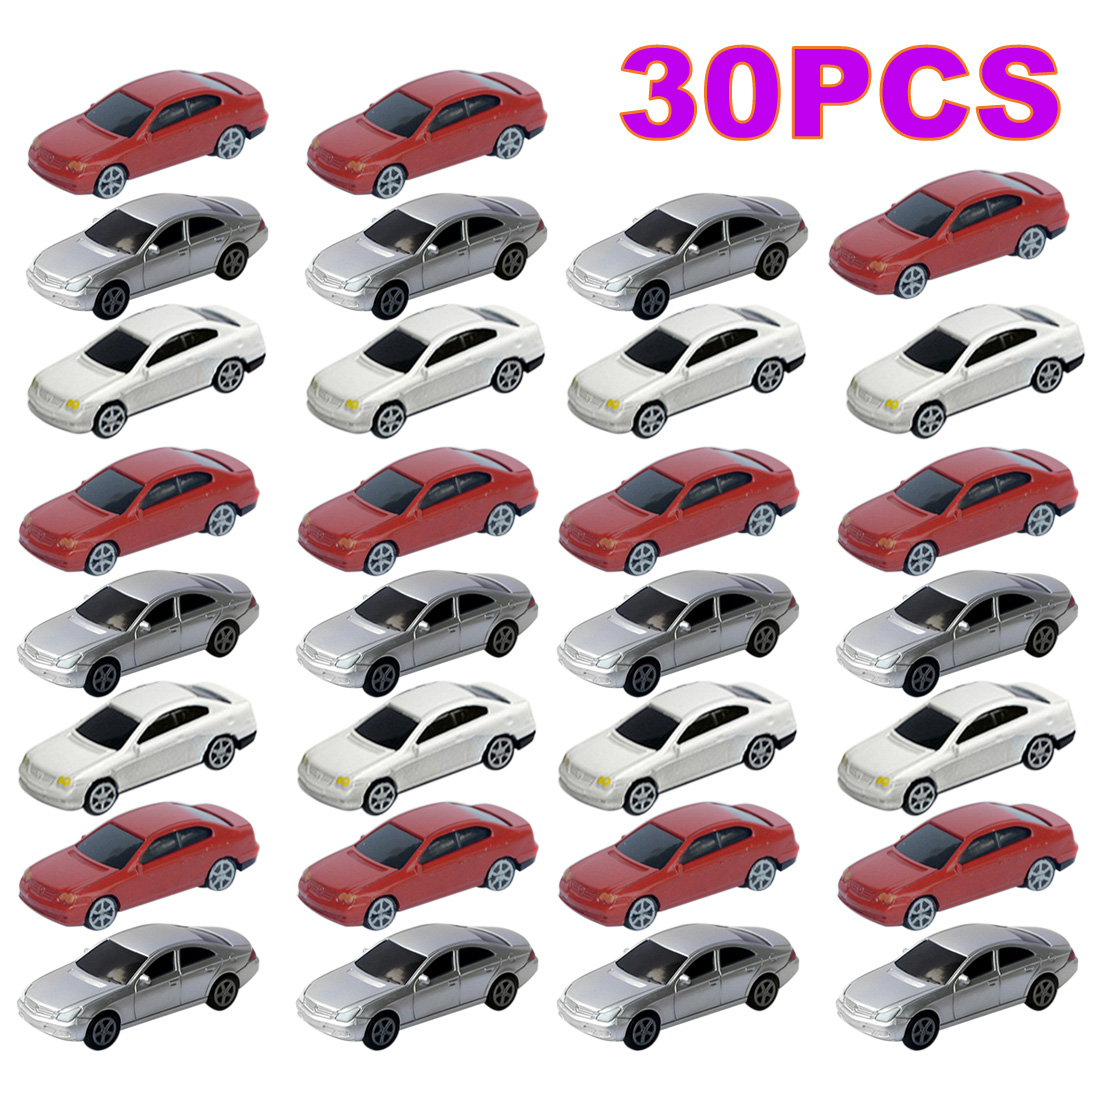 30Pcs 1/75/100/150/200 Scale Simulation Plastic Mini Car Plastic Model Car For DIY Sand Table Building Model - Random Color